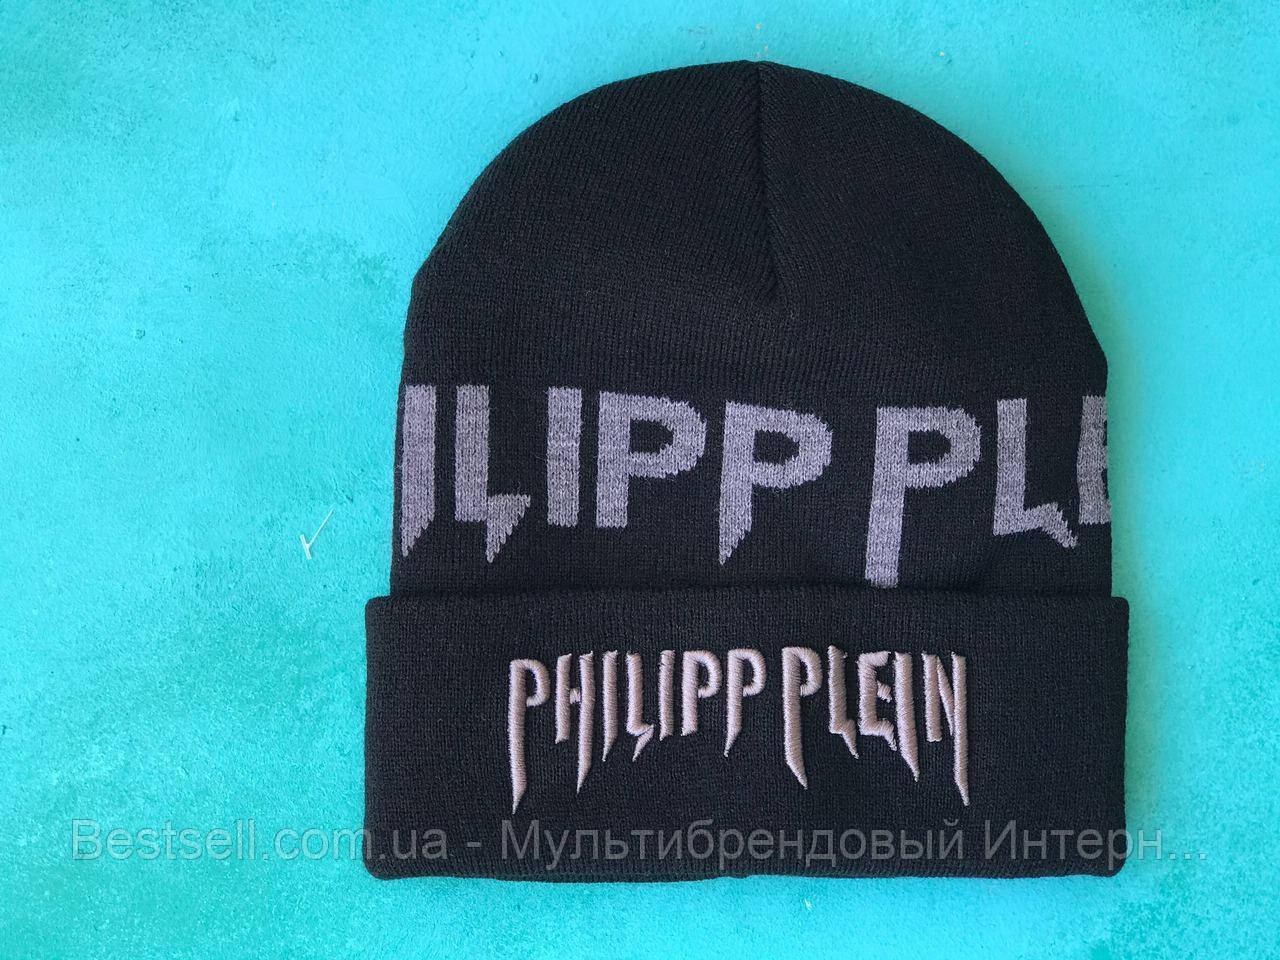 Шапка Philipp Plein / шапка філіп преин / шапка жіноча/шапка чоловіча/ чорний